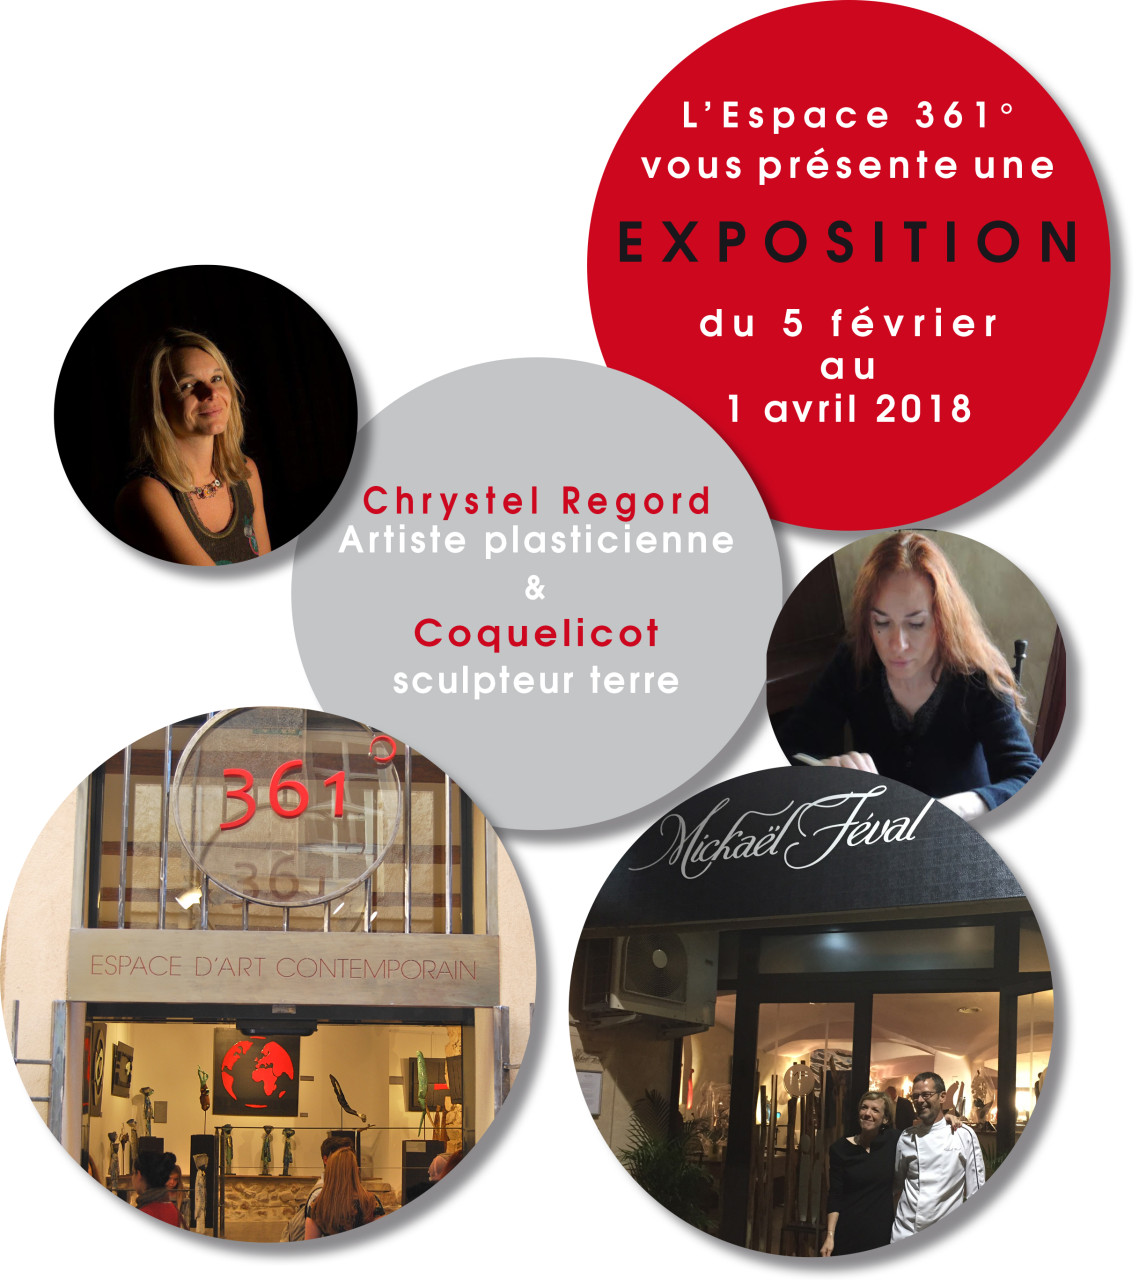 Visuel Web MF expo Coquelicot&ChrystelR